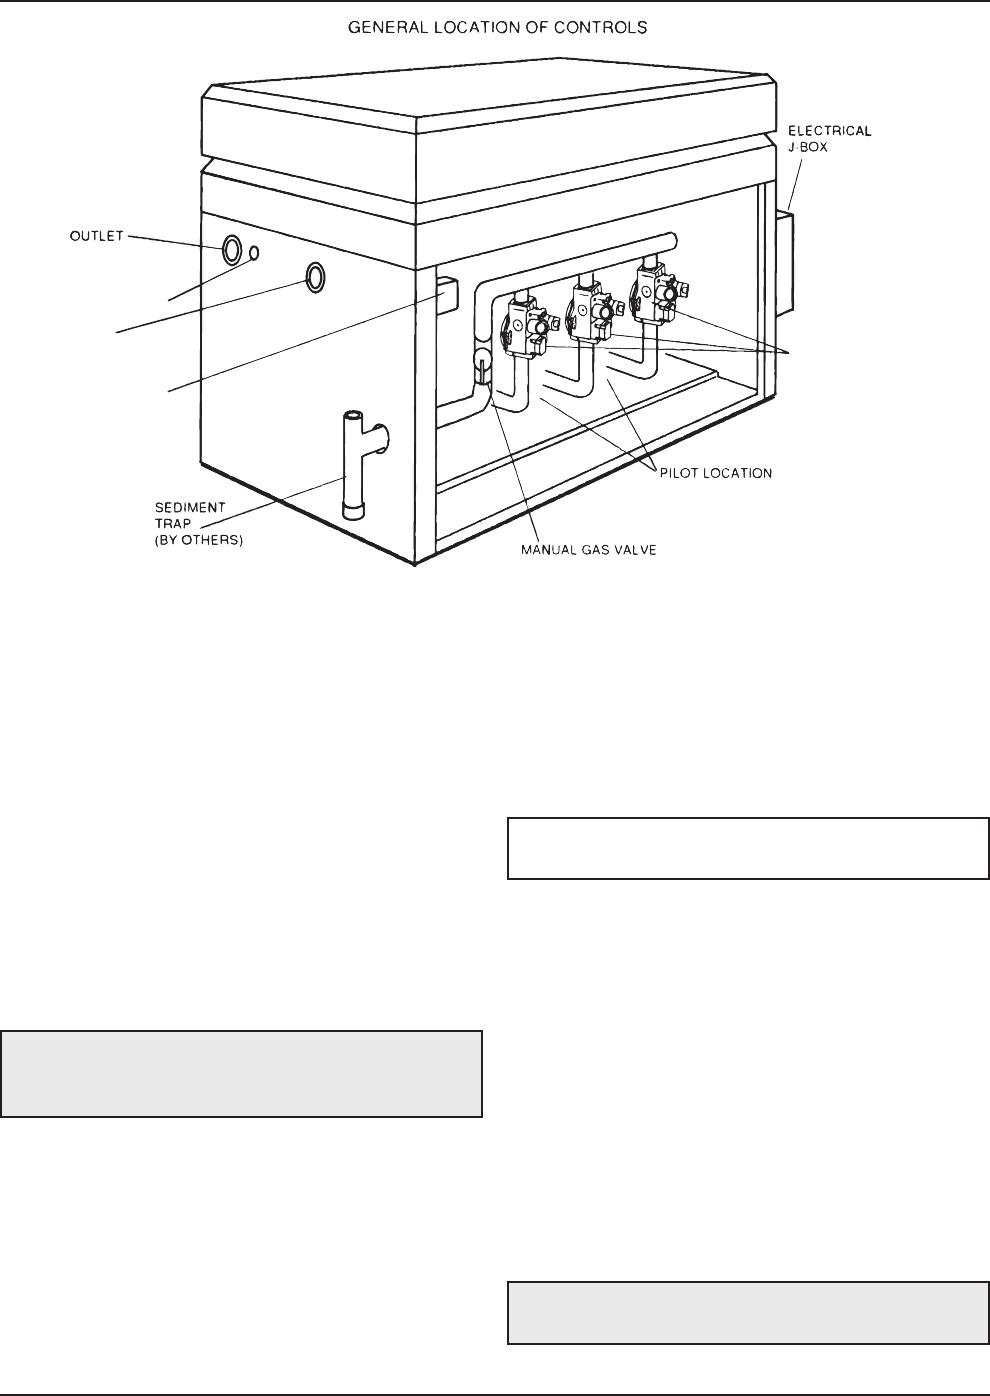 medium resolution of raypak raytherm 133 4001 users manual 6000 59 new rp2100 25